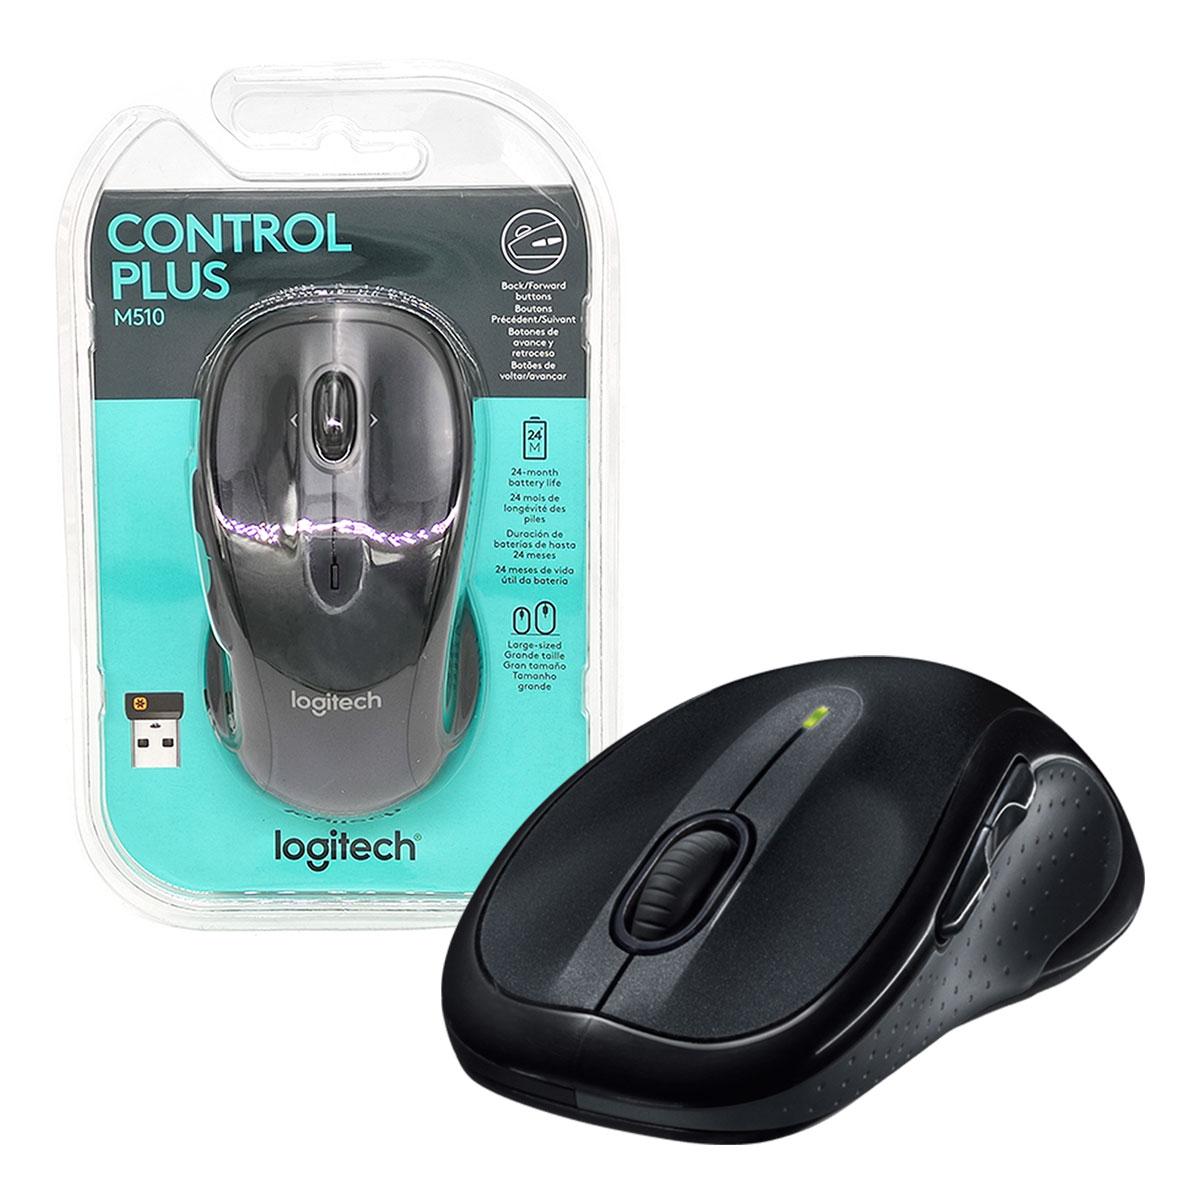 Mouse Wireless Logitech M510, 1000 DPI, Tecnologia Unifying, Preto